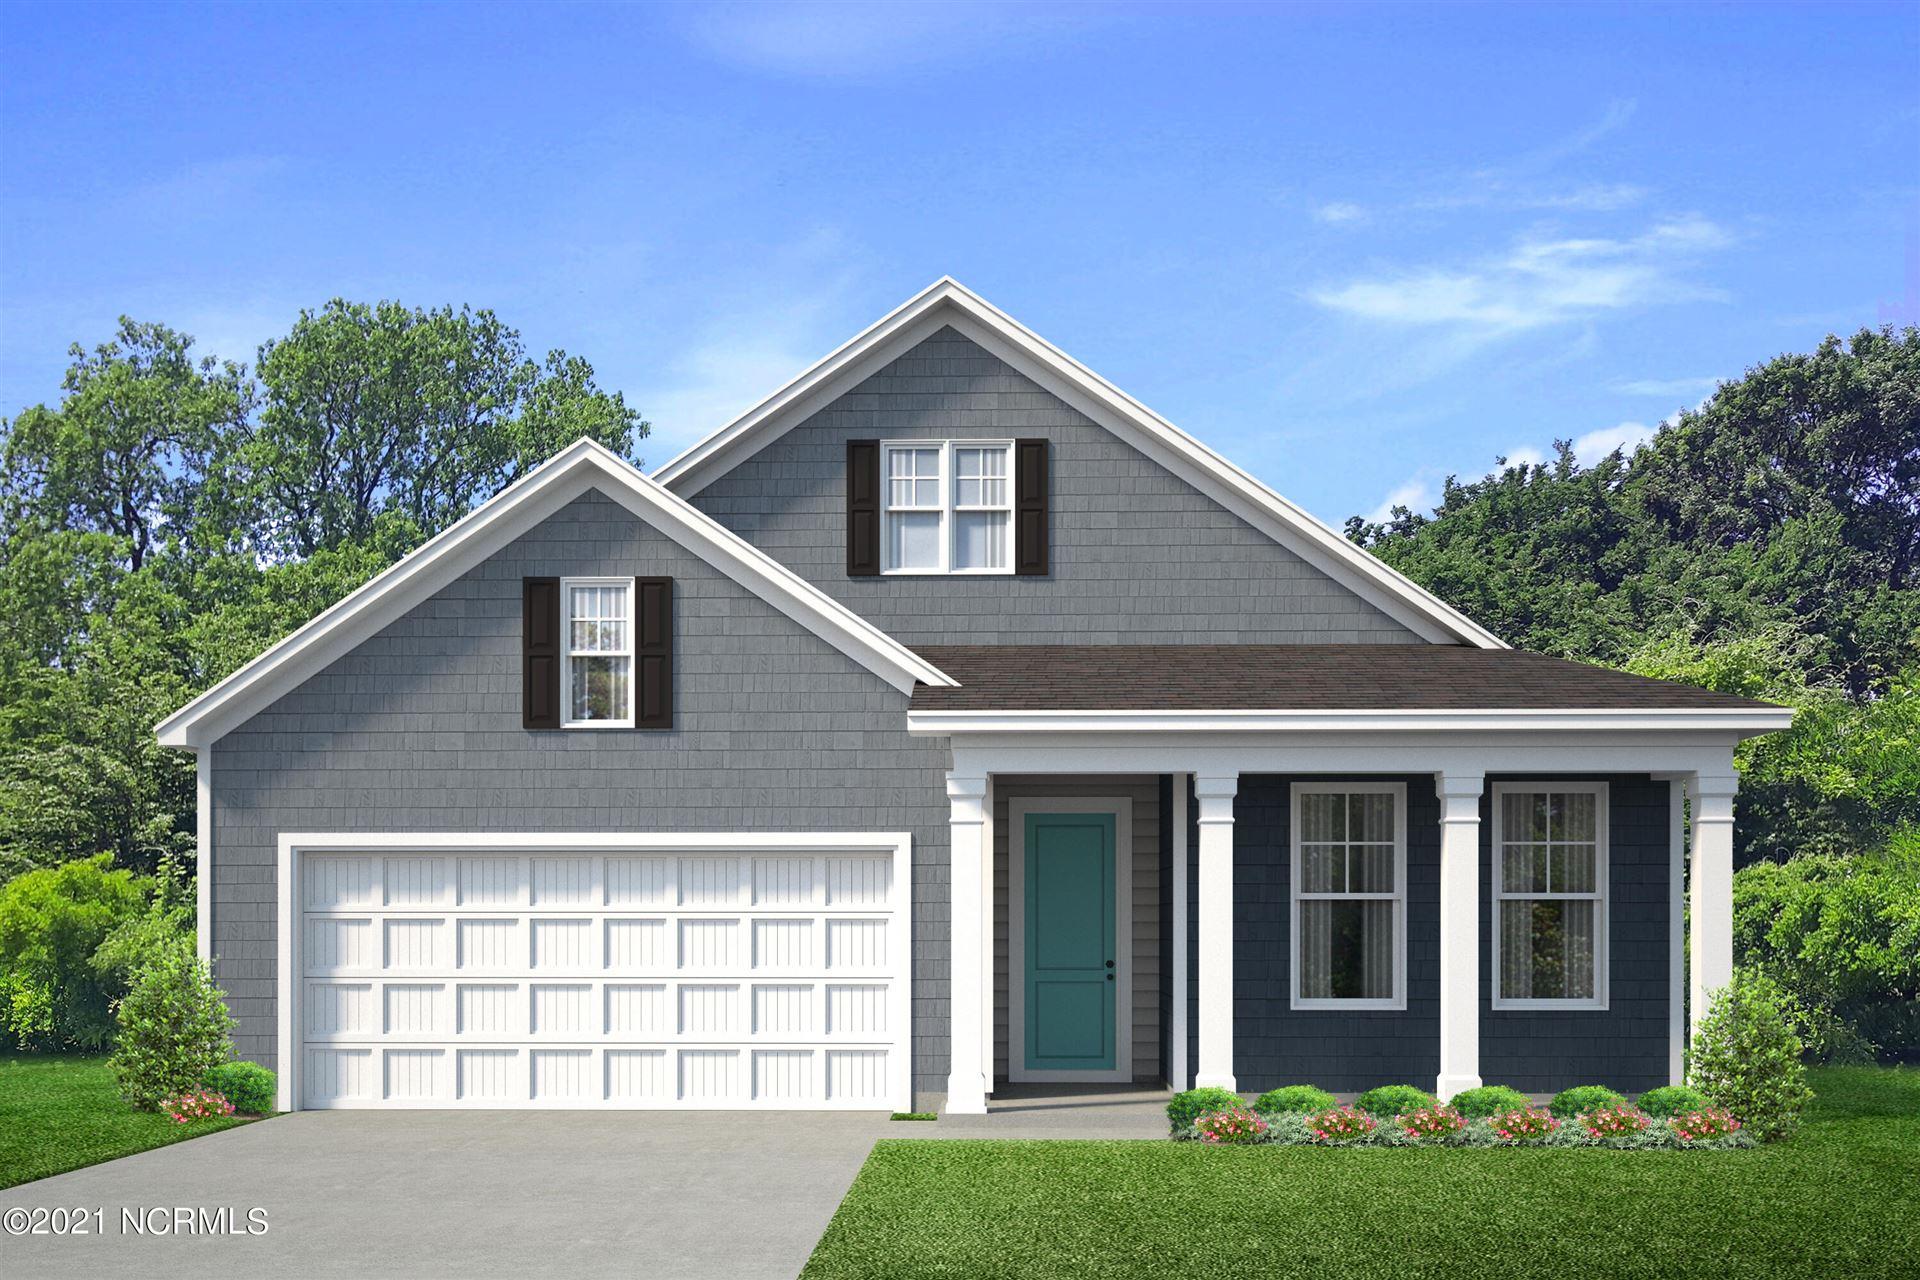 Photo of 517 Birdsong Drive #Lot 26, Holly Ridge, NC 28445 (MLS # 100295042)